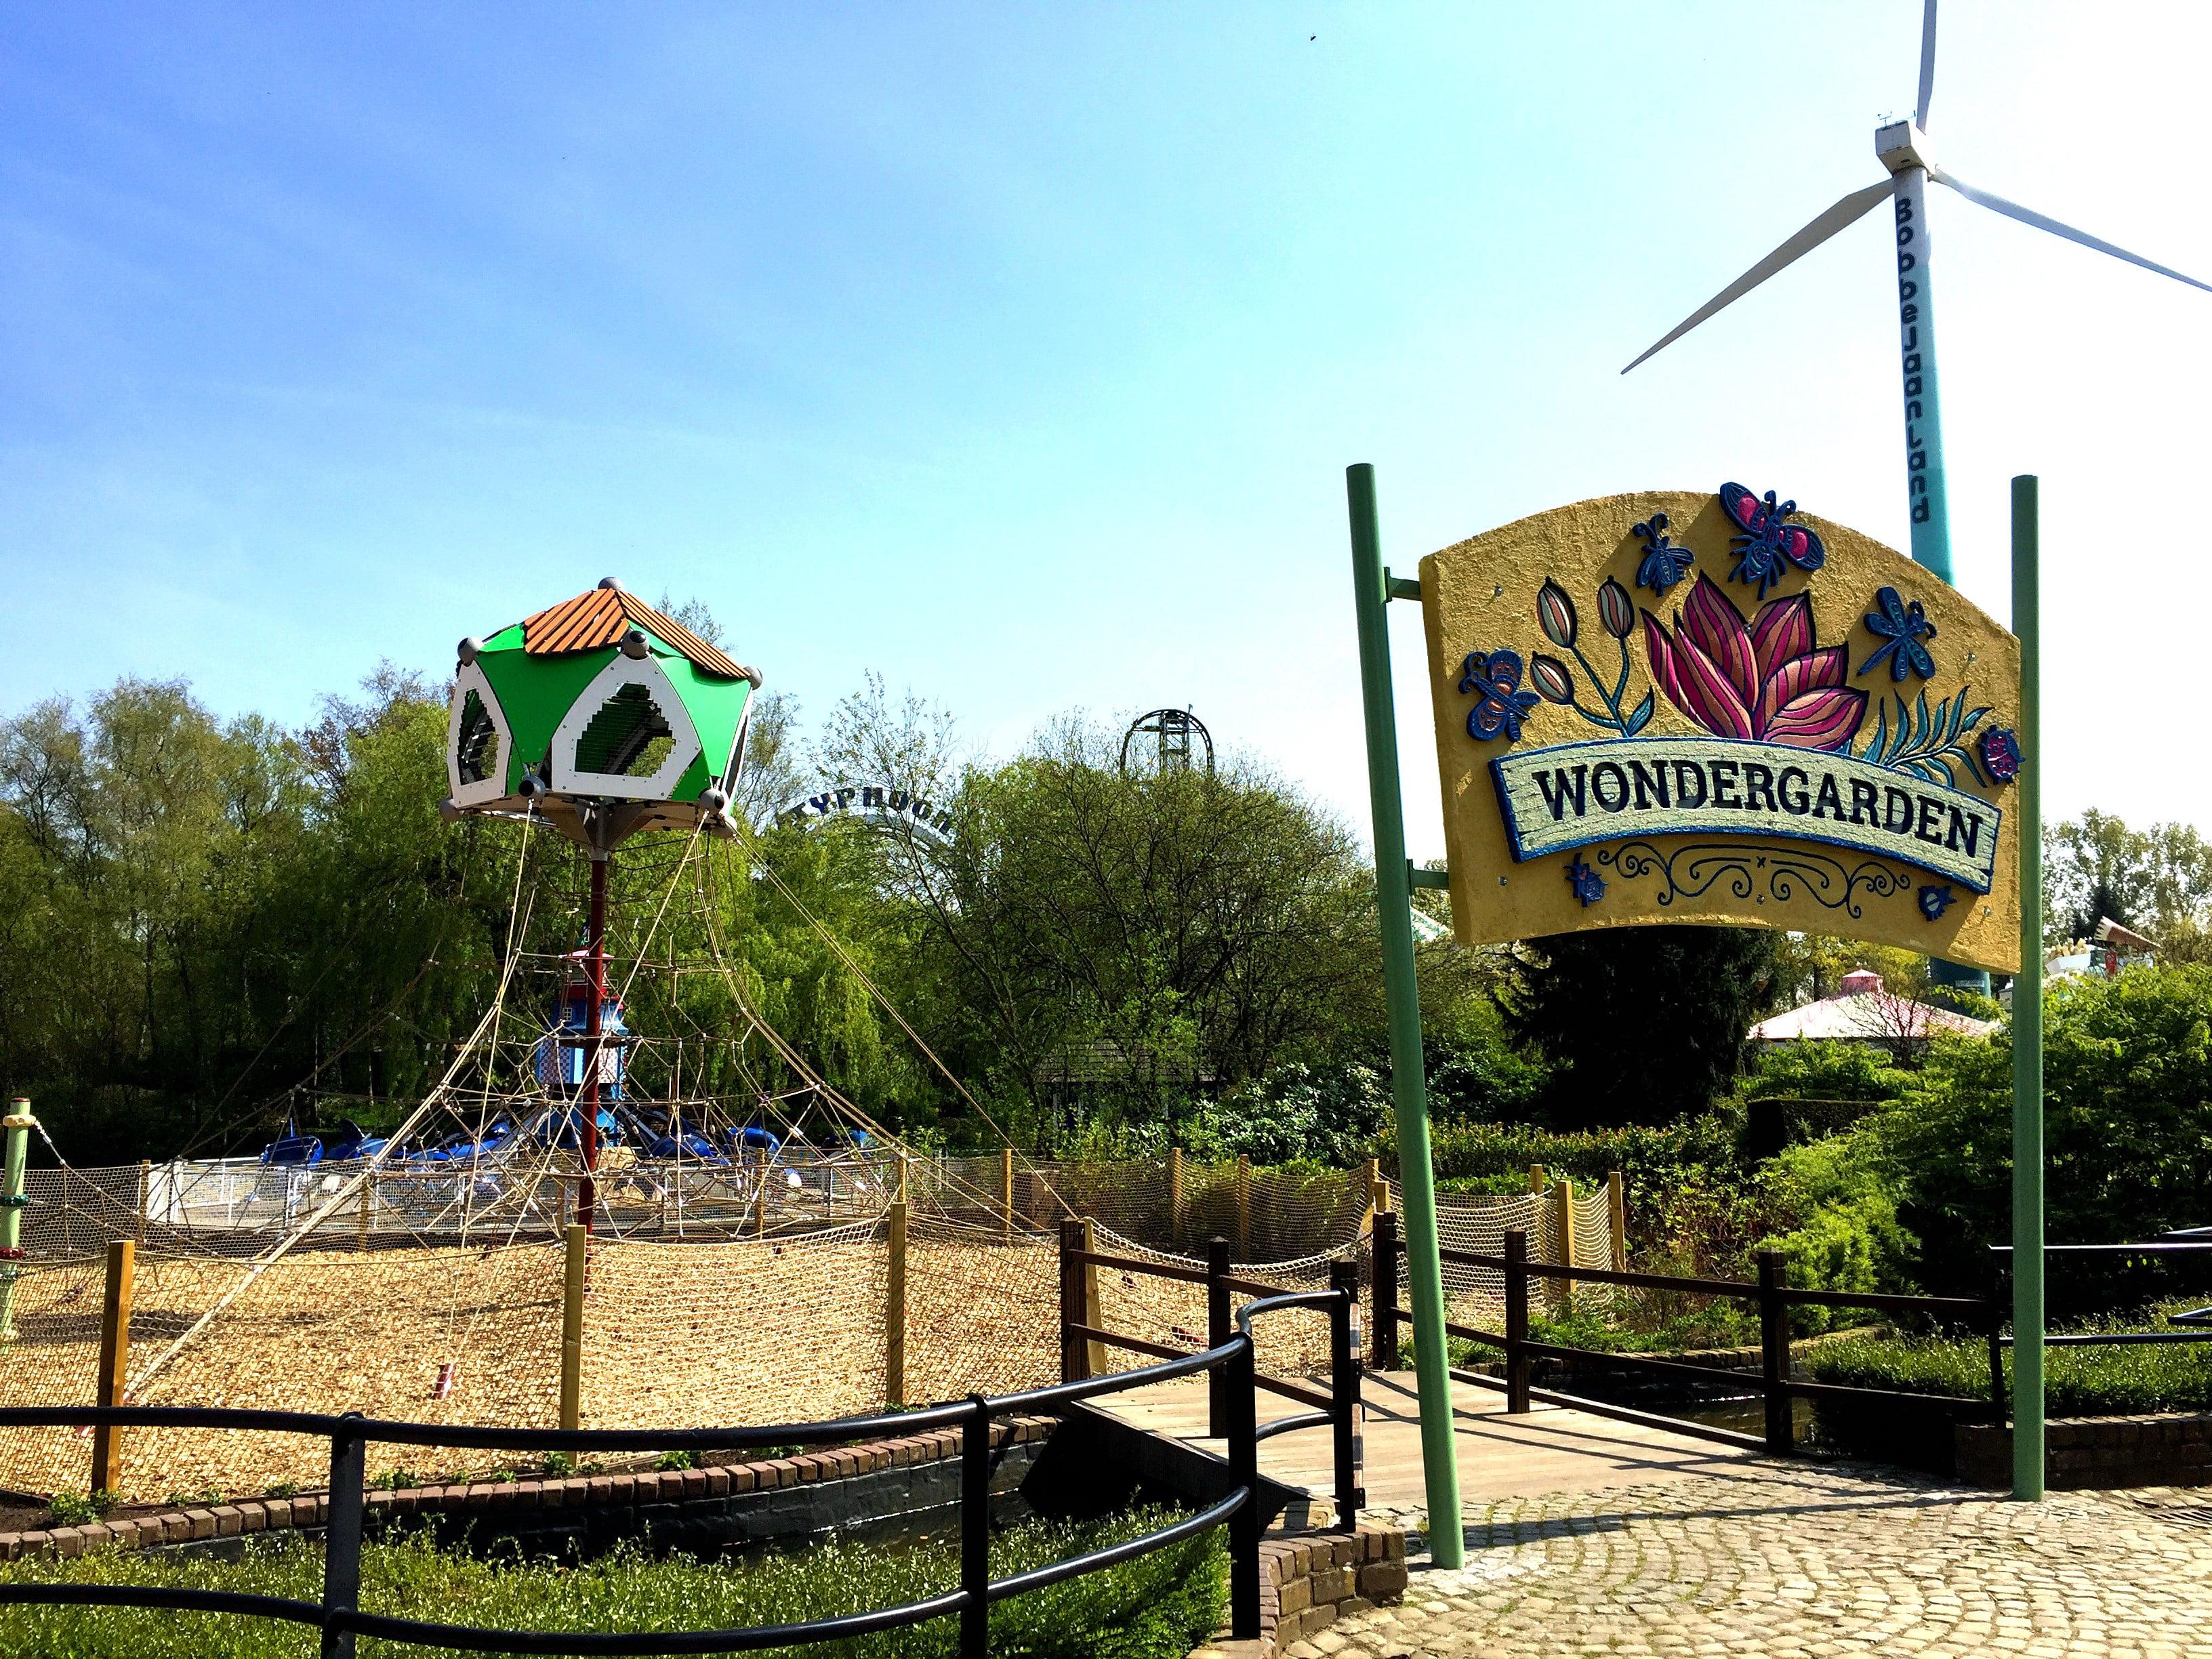 Artikelbild von Wondergarden in Bobbejaanland, Belgium